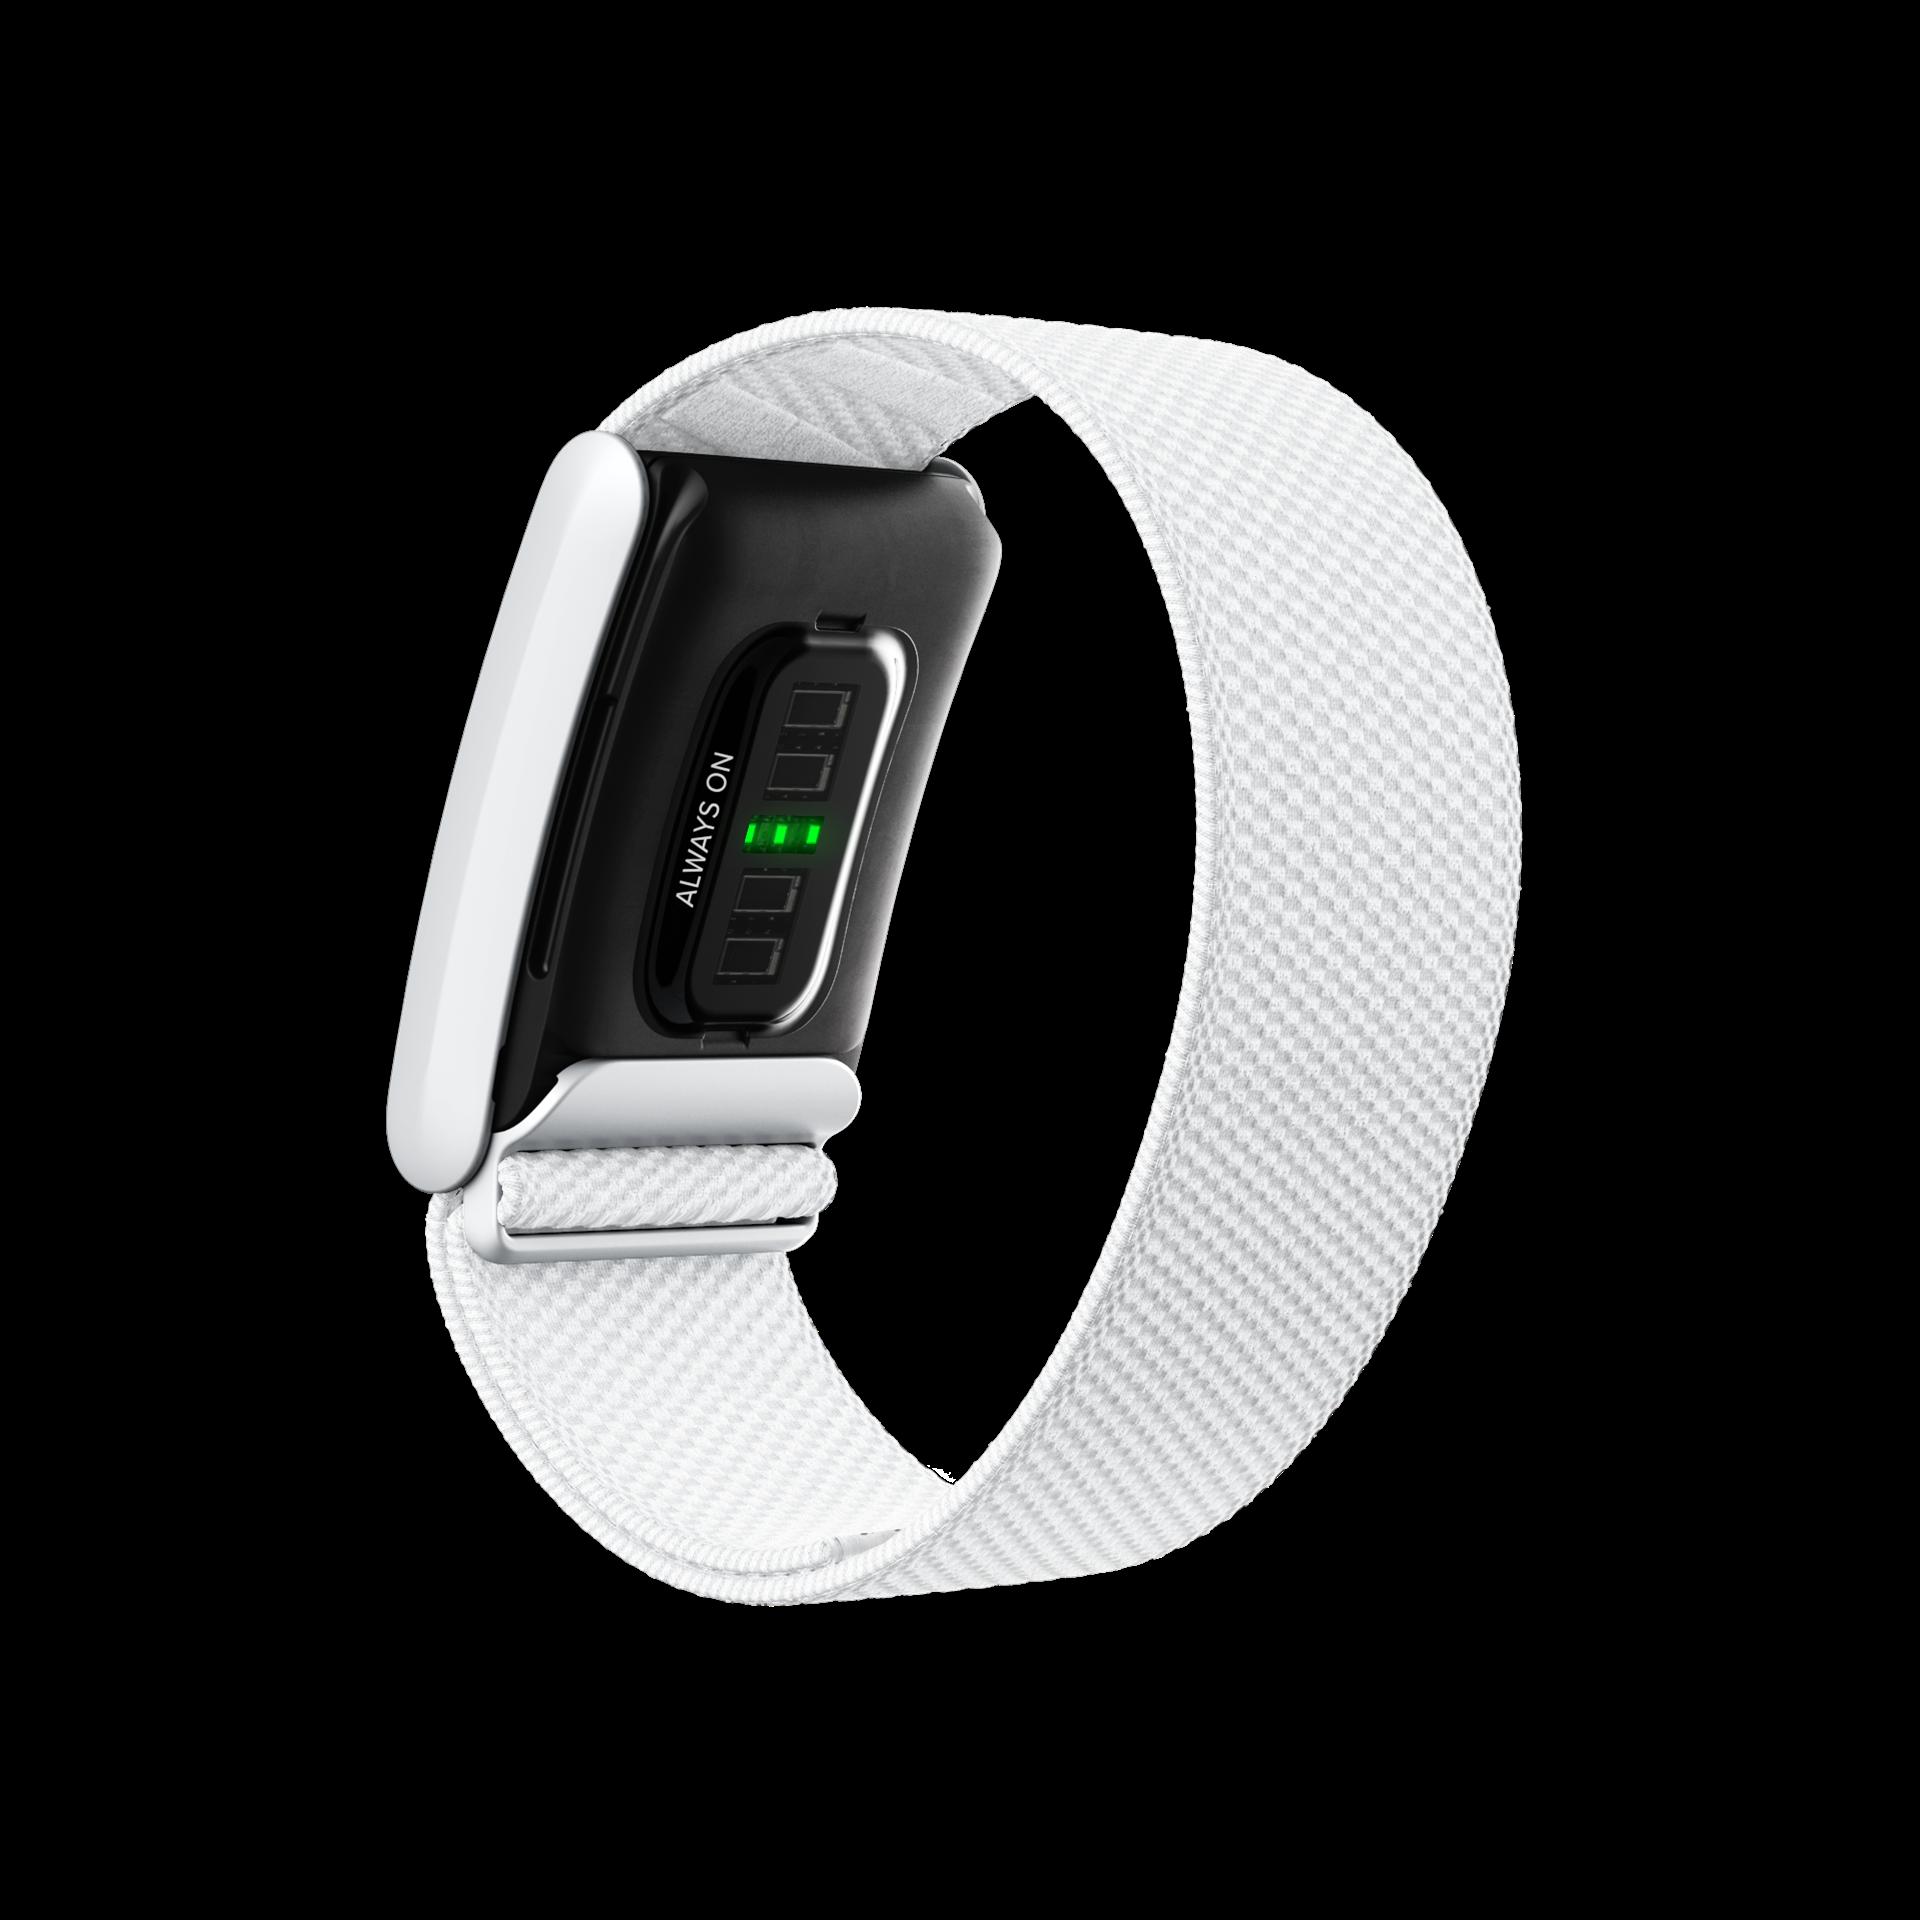 The Whoop 4.0's new sensor